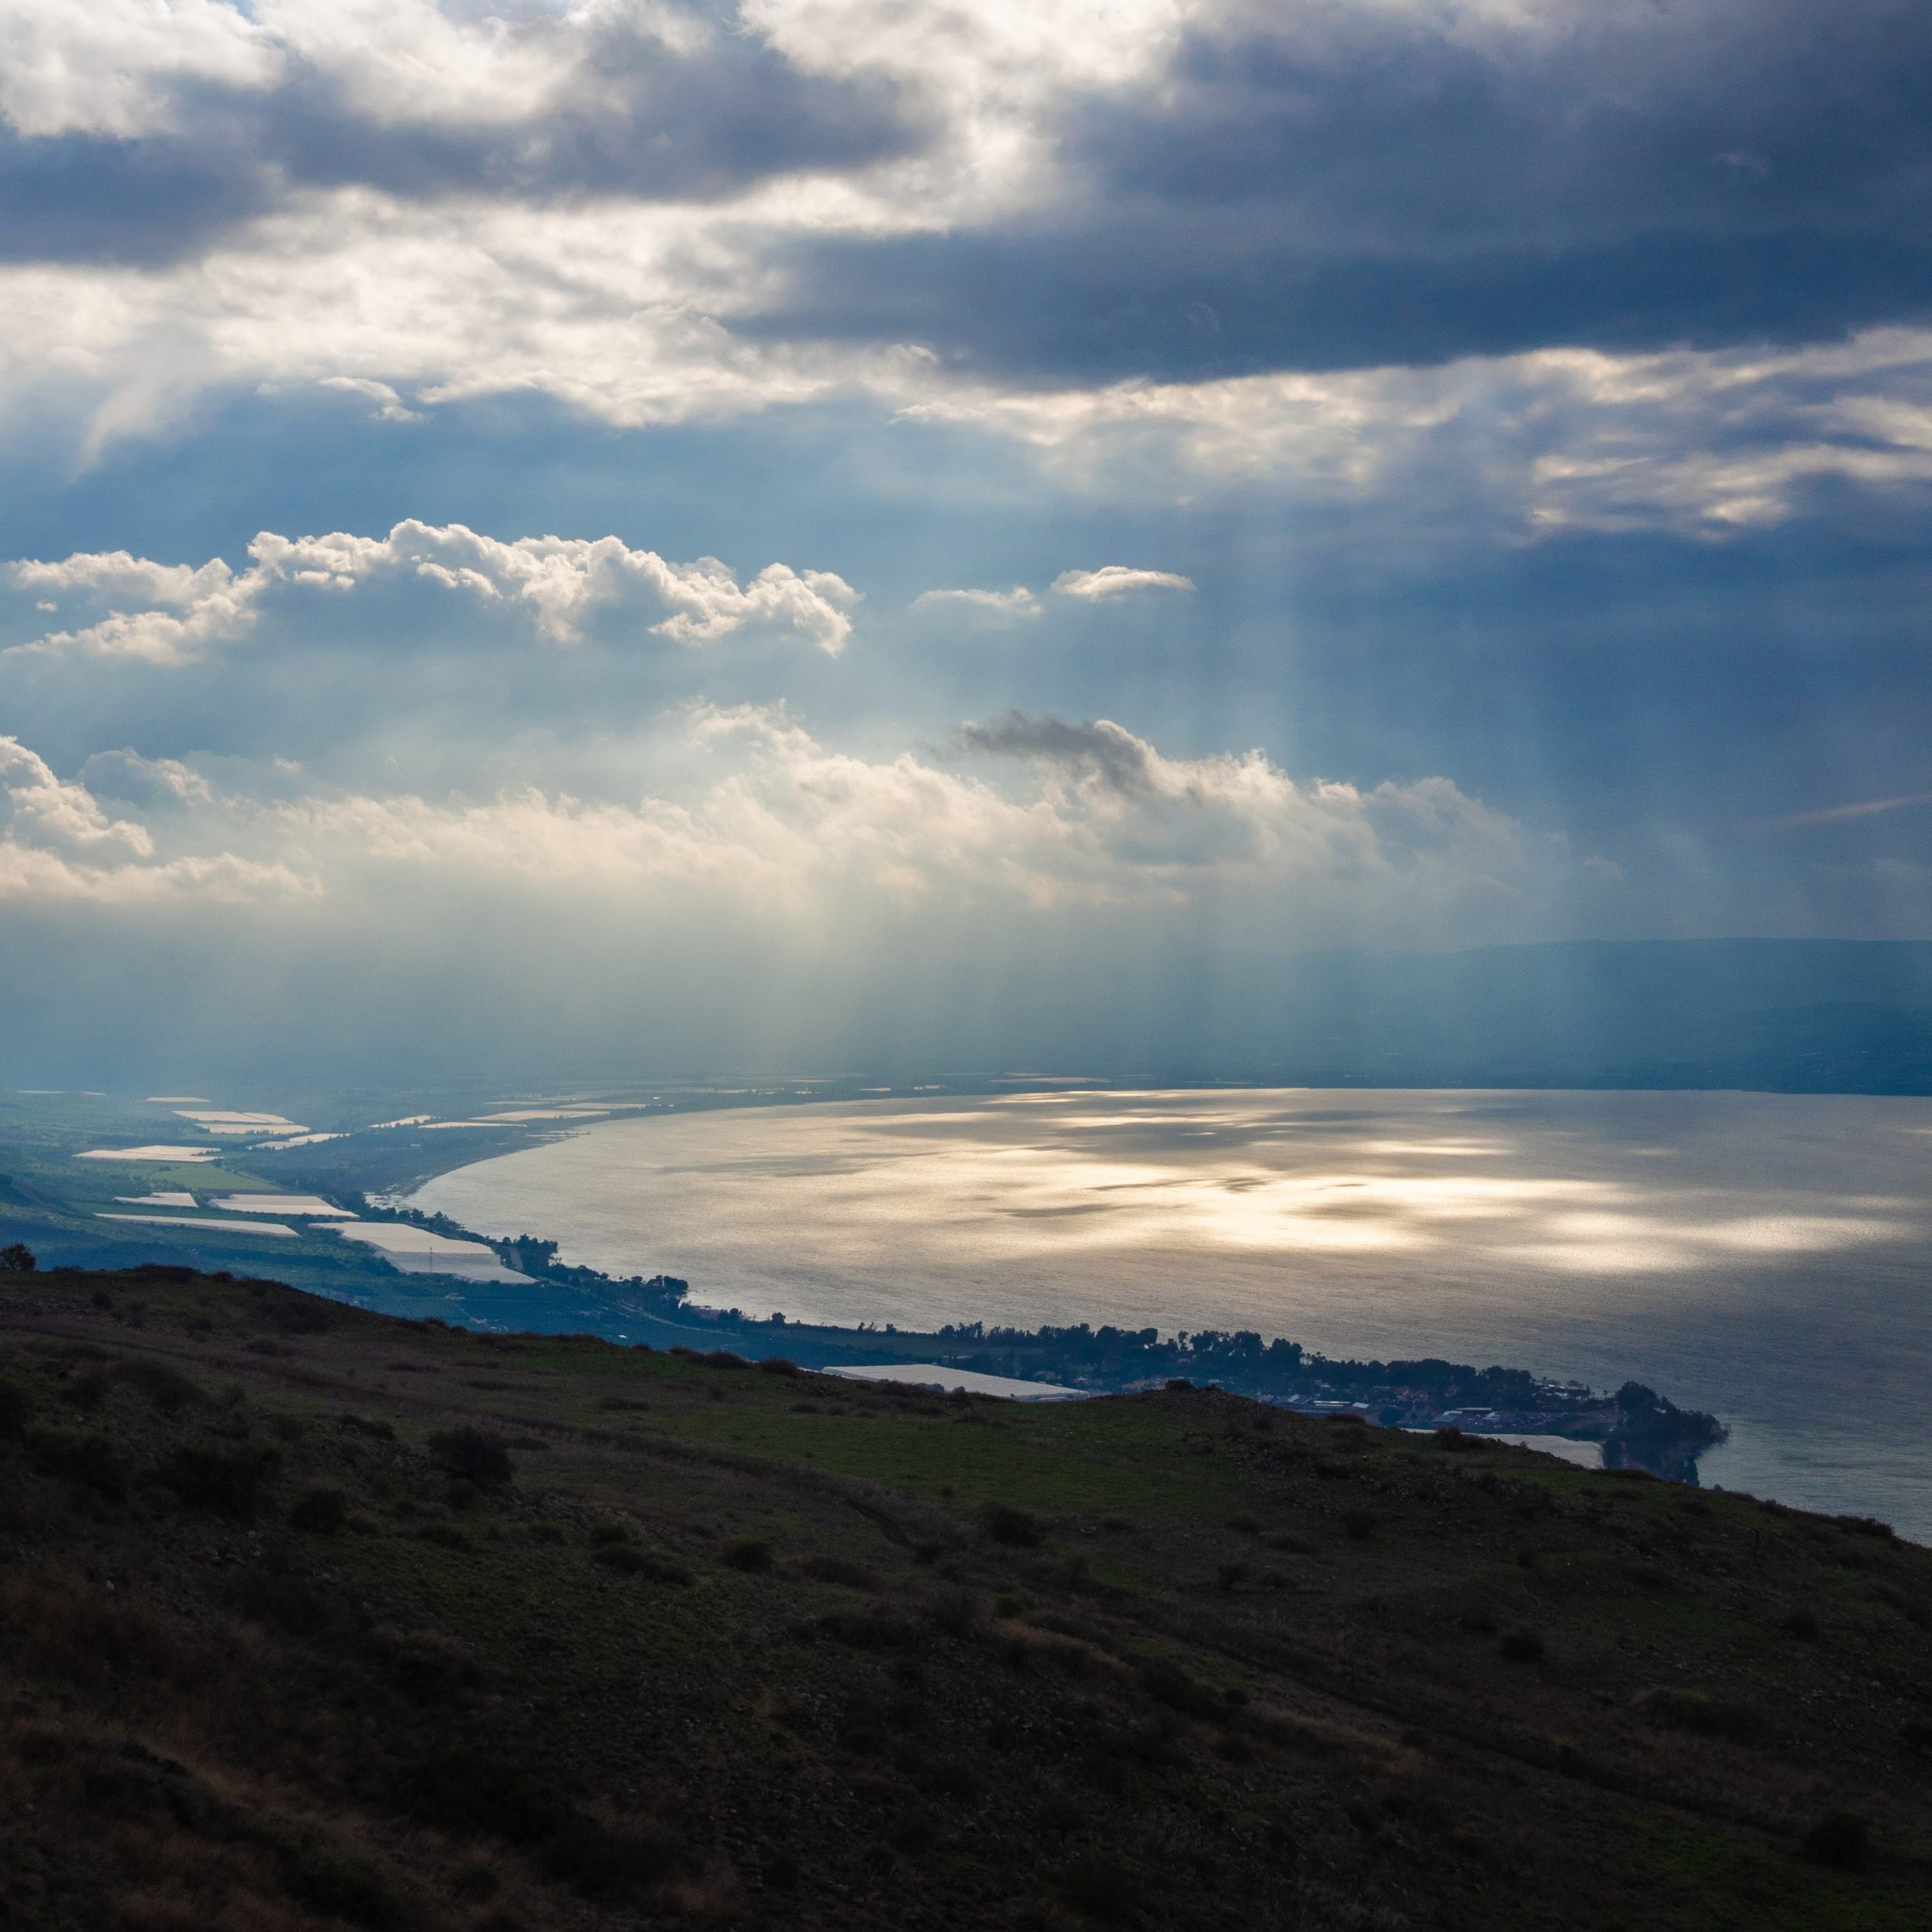 Pilgrimage to Galilee, Part II